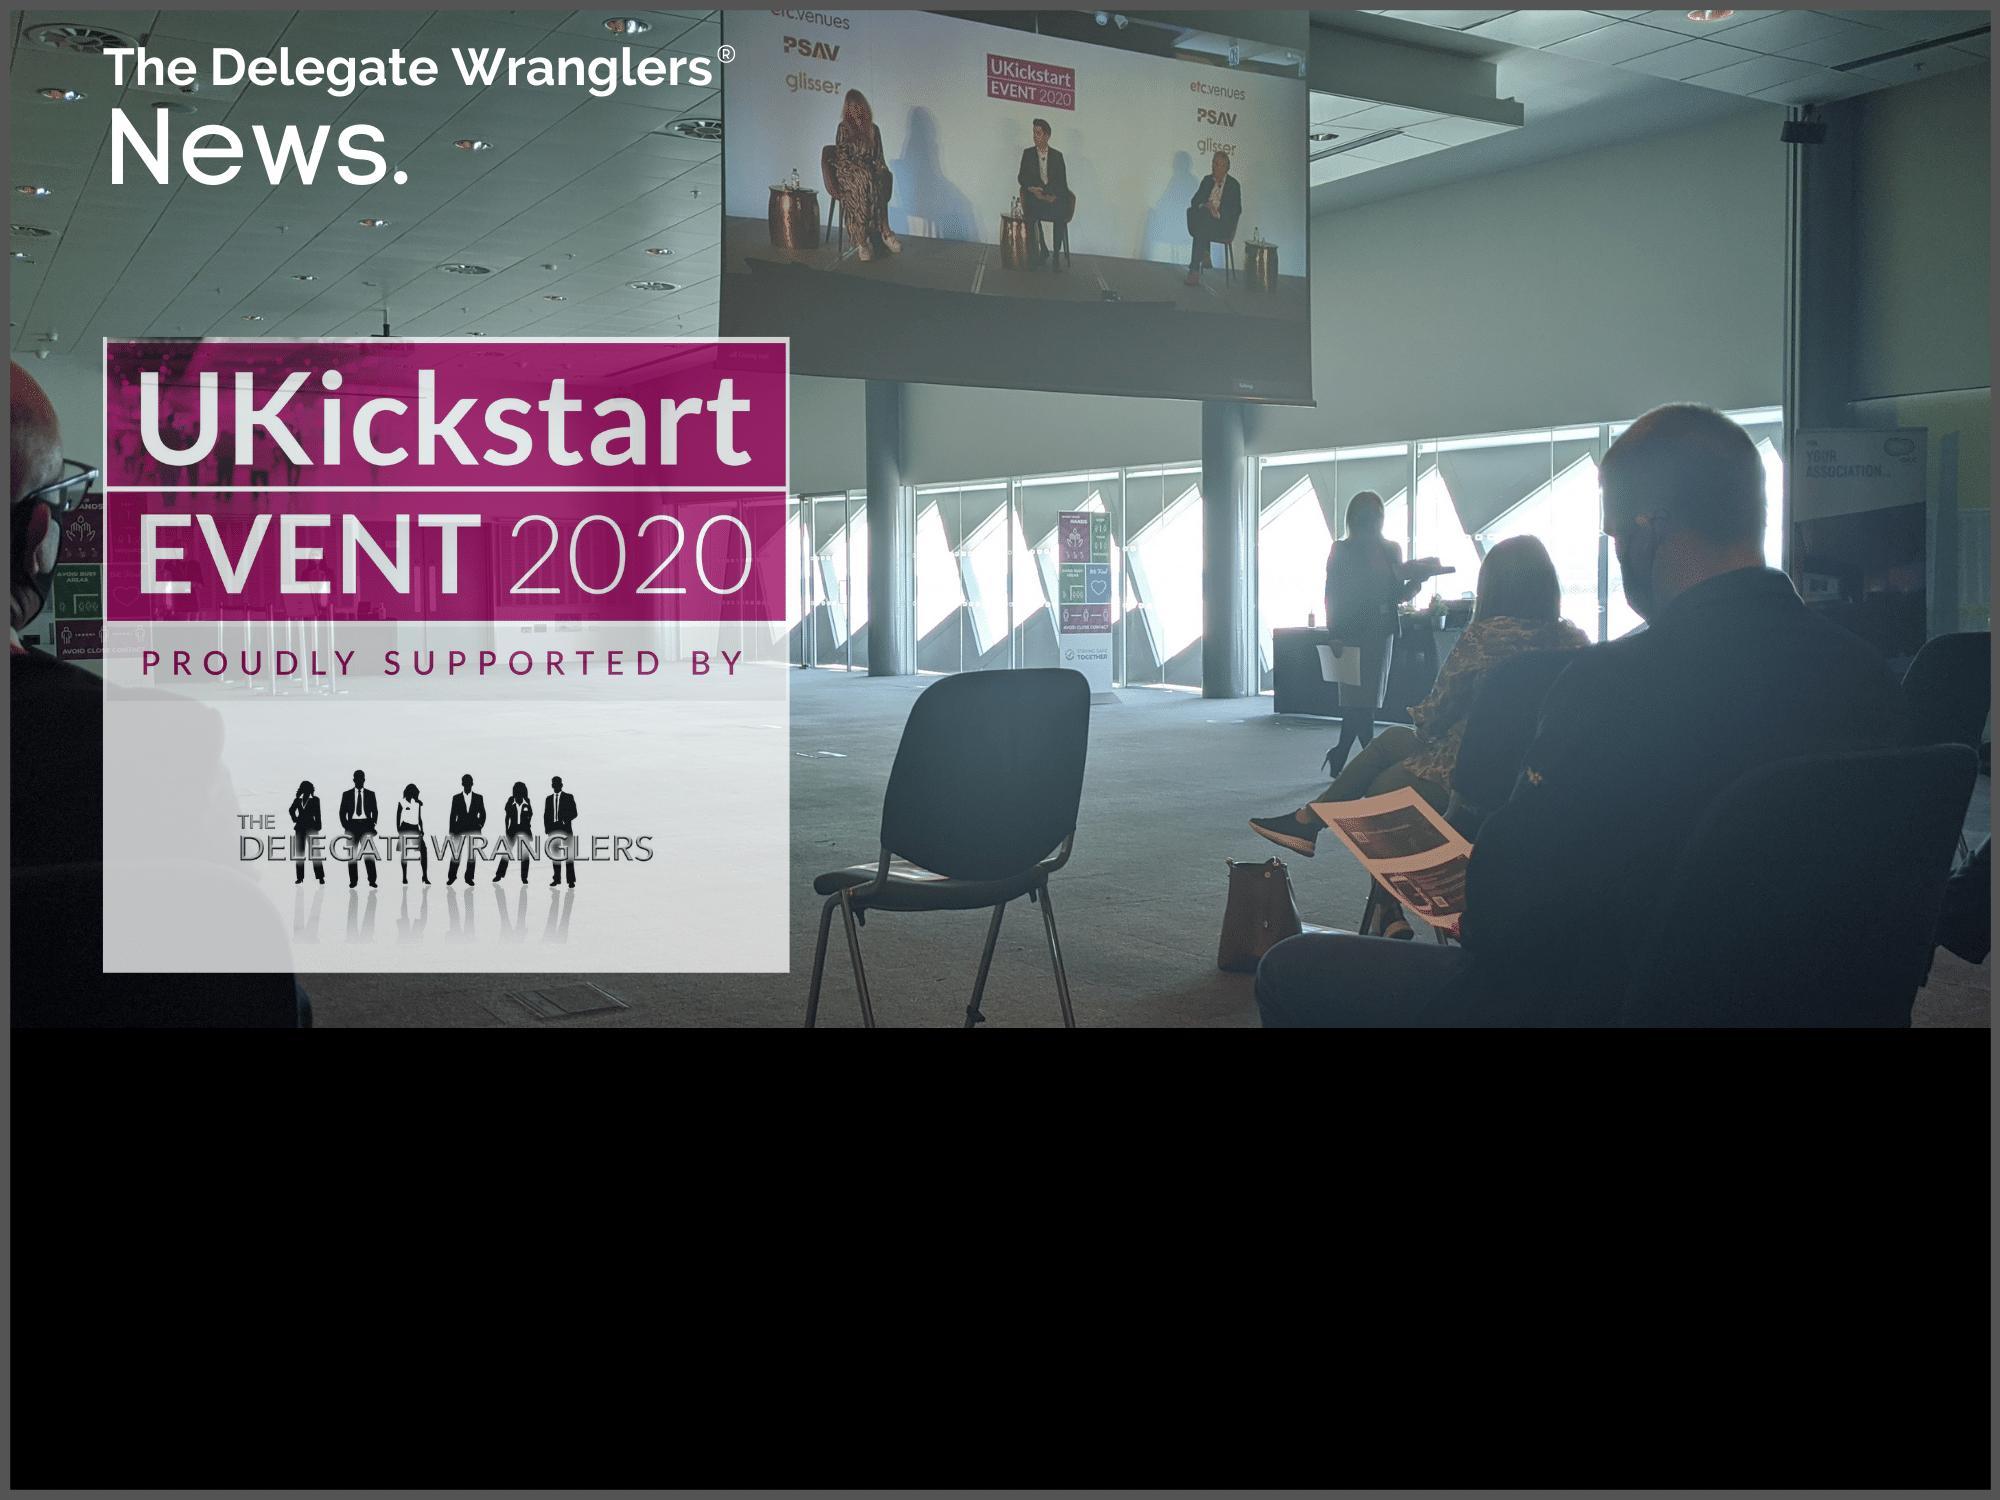 Tourism Minister Nigel Huddleston MP takes part in UKickstart Event 2020